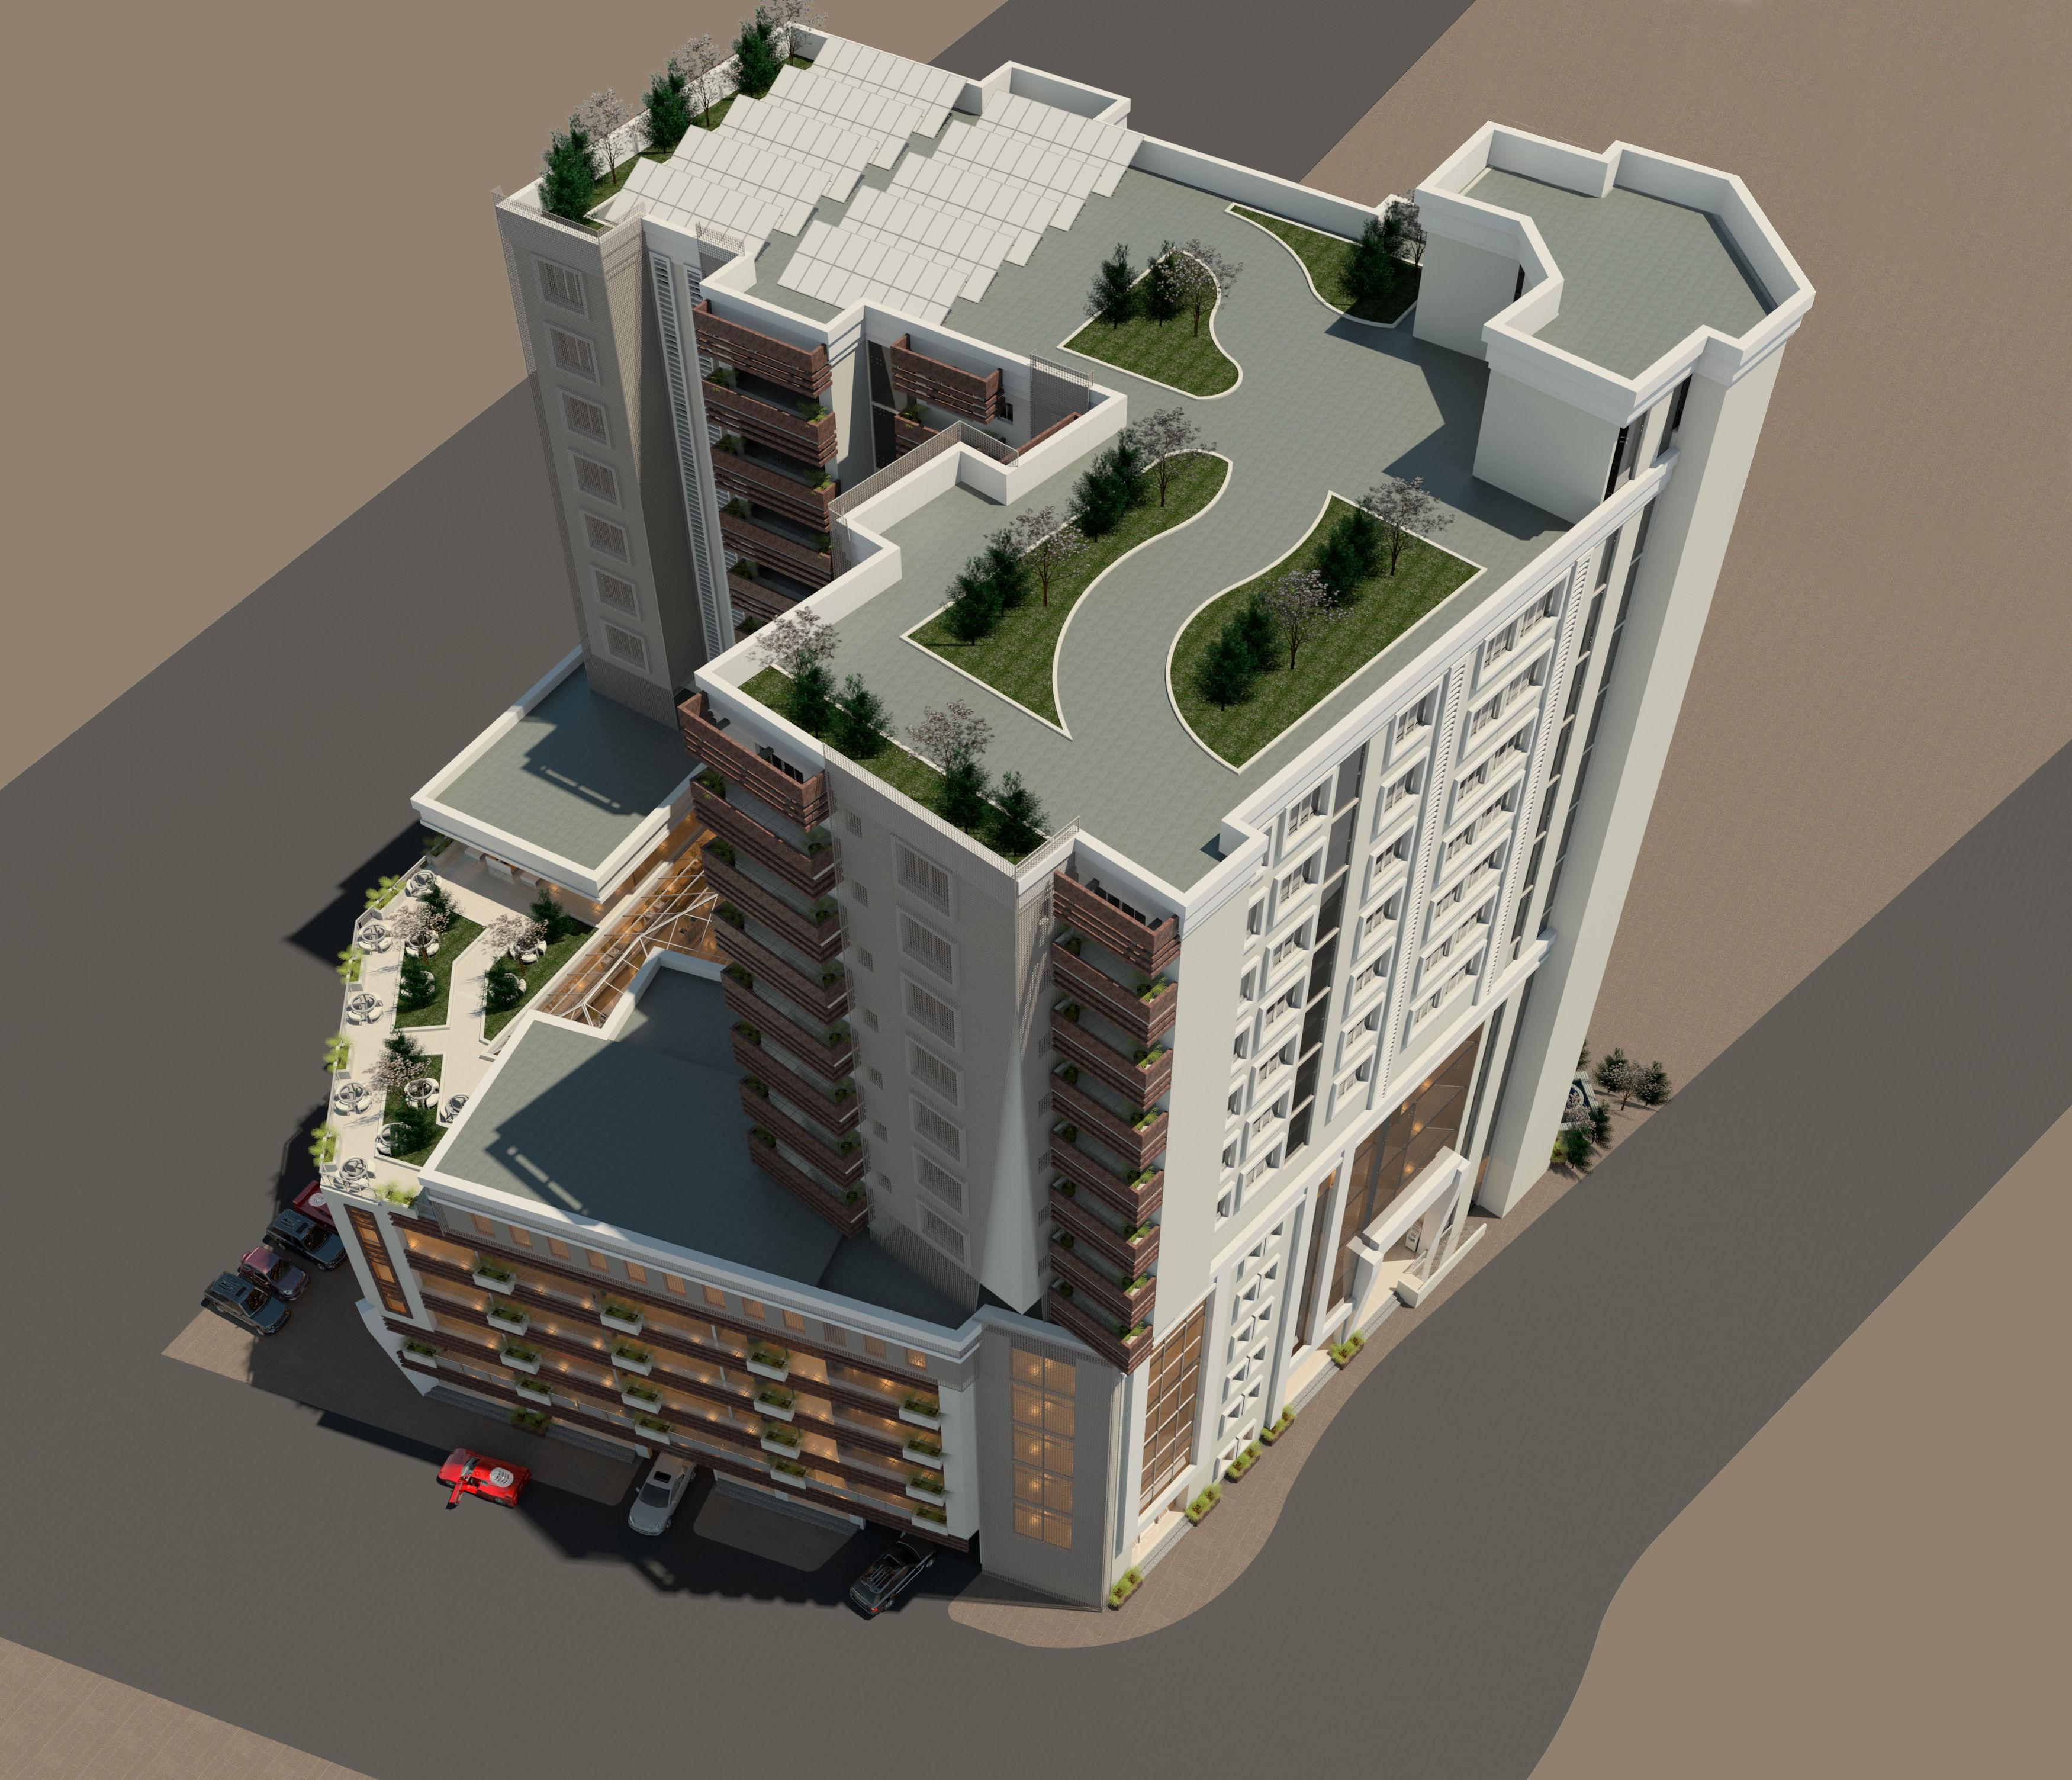 Apartment Shopper: Mixed Apartment/Shopping Mall